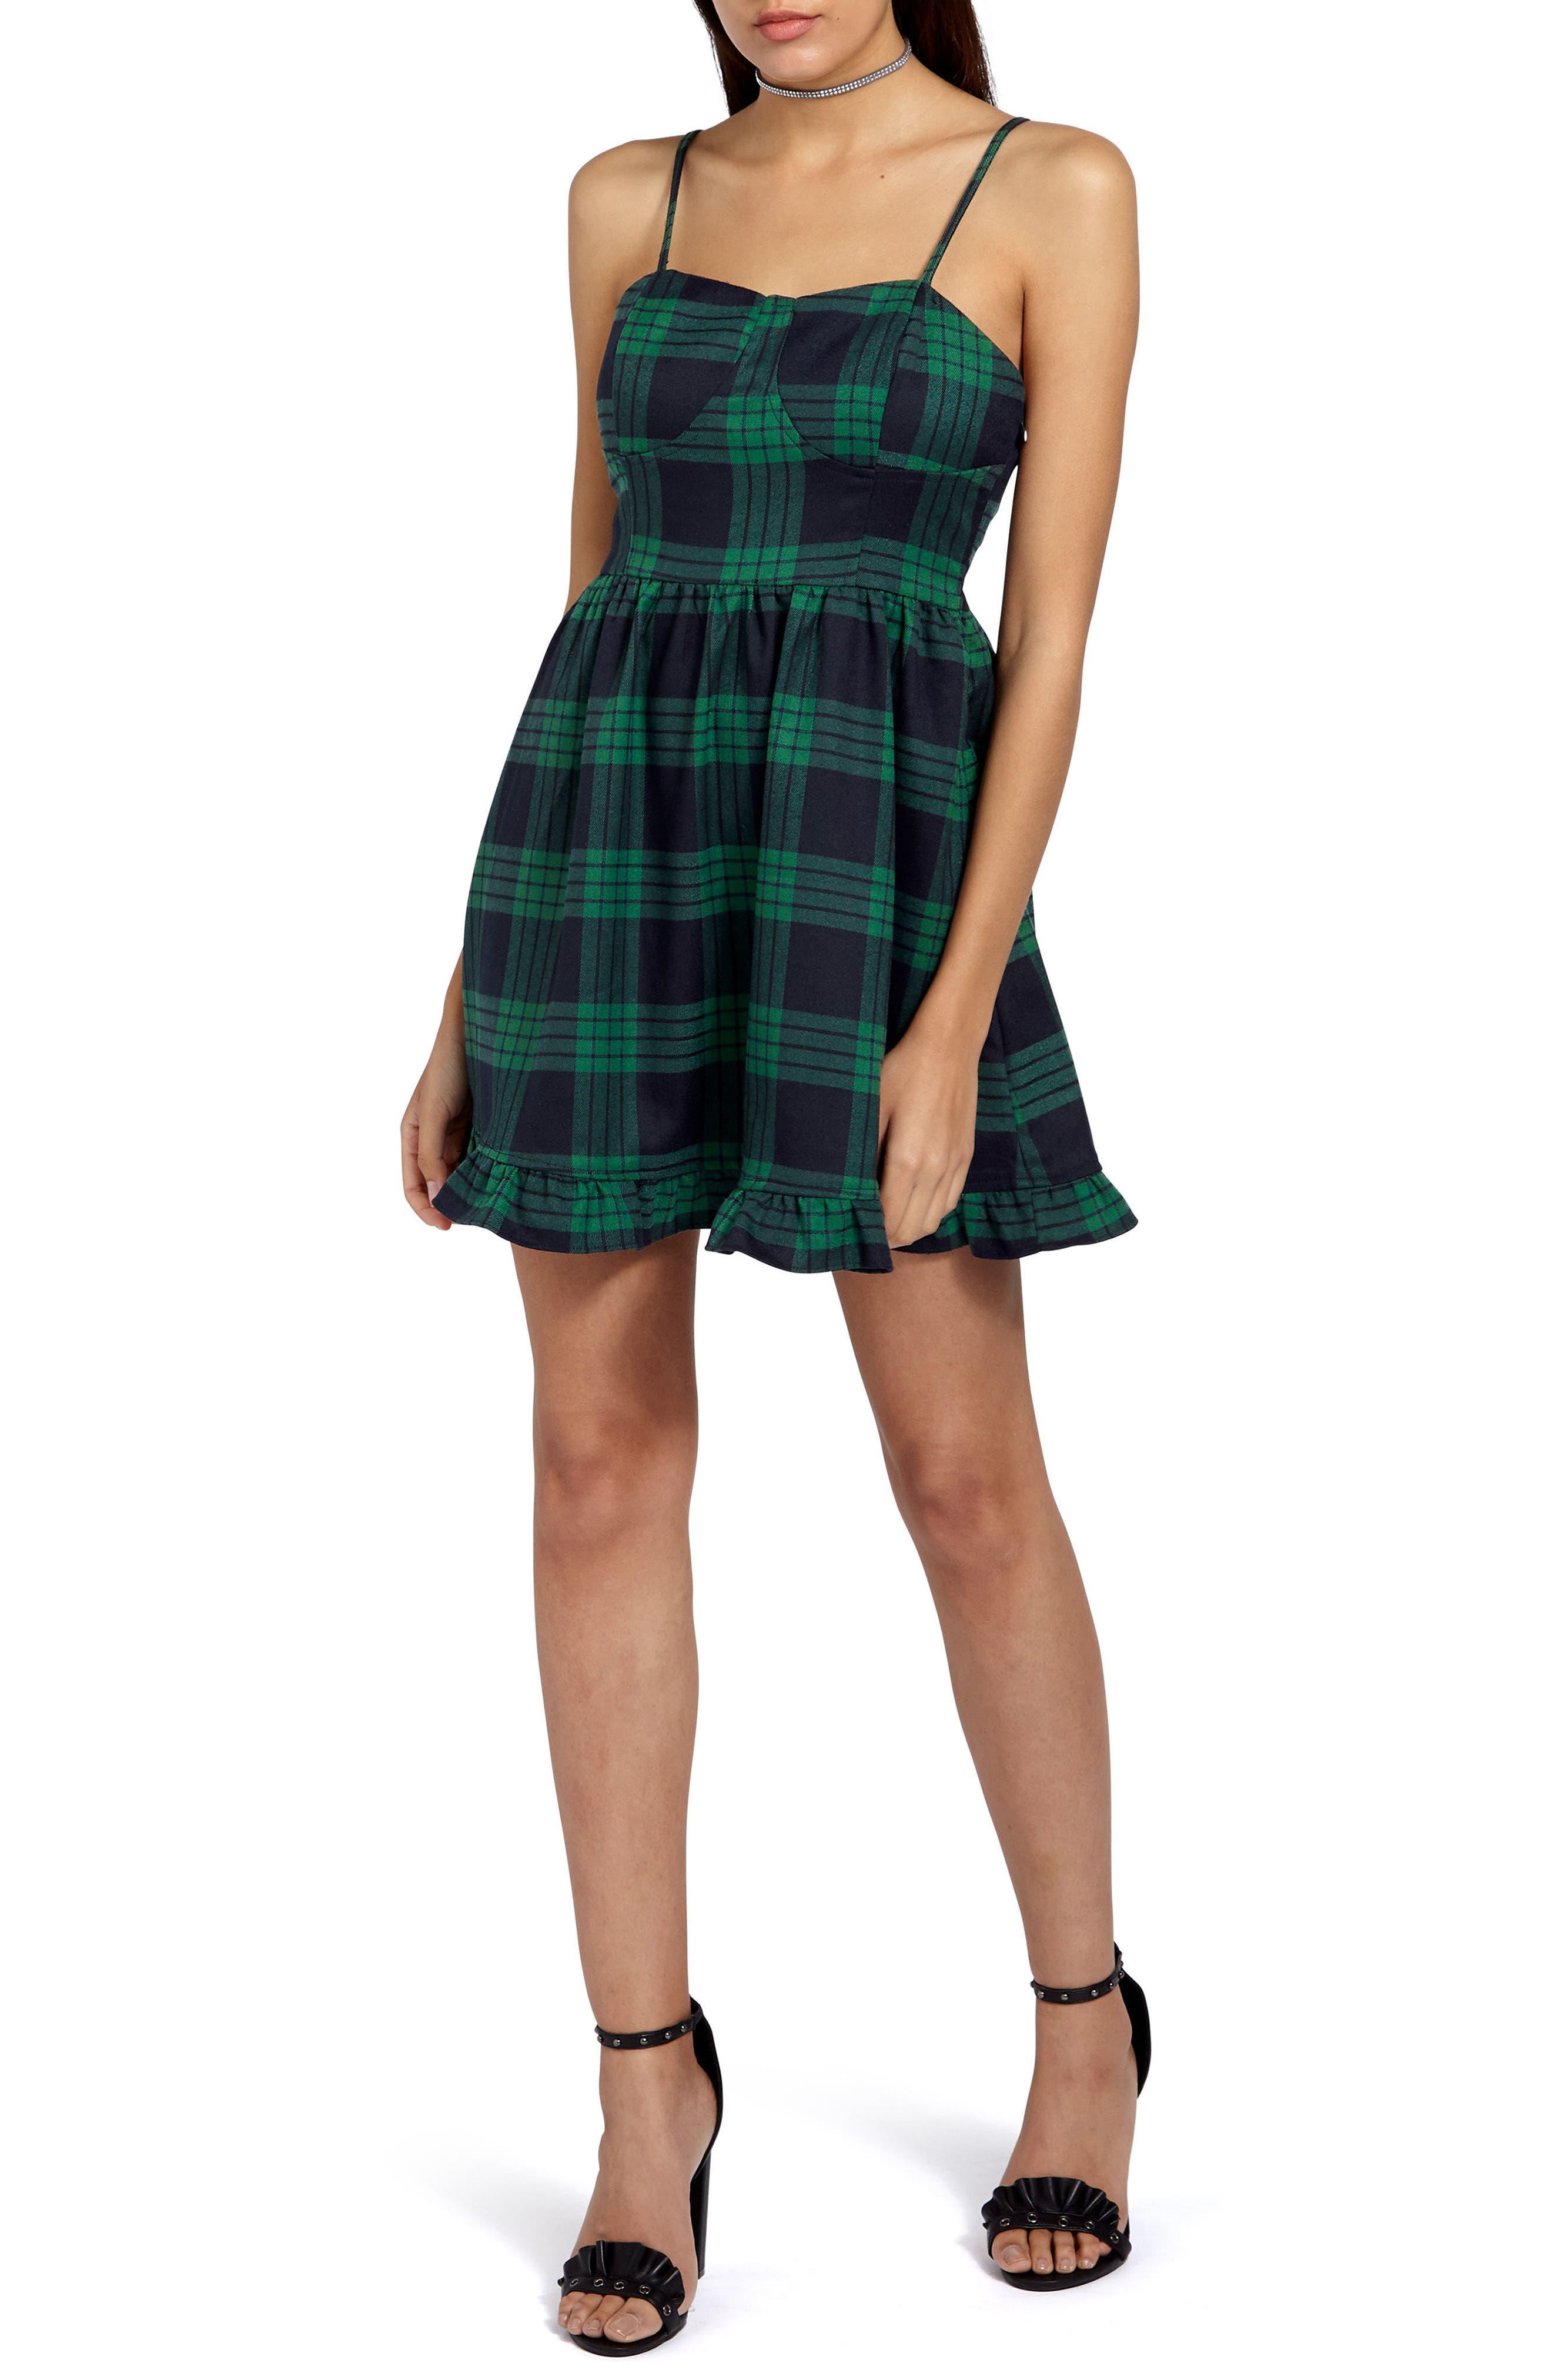 Tartan Plaid Minidress,                         Main,                         color, Green